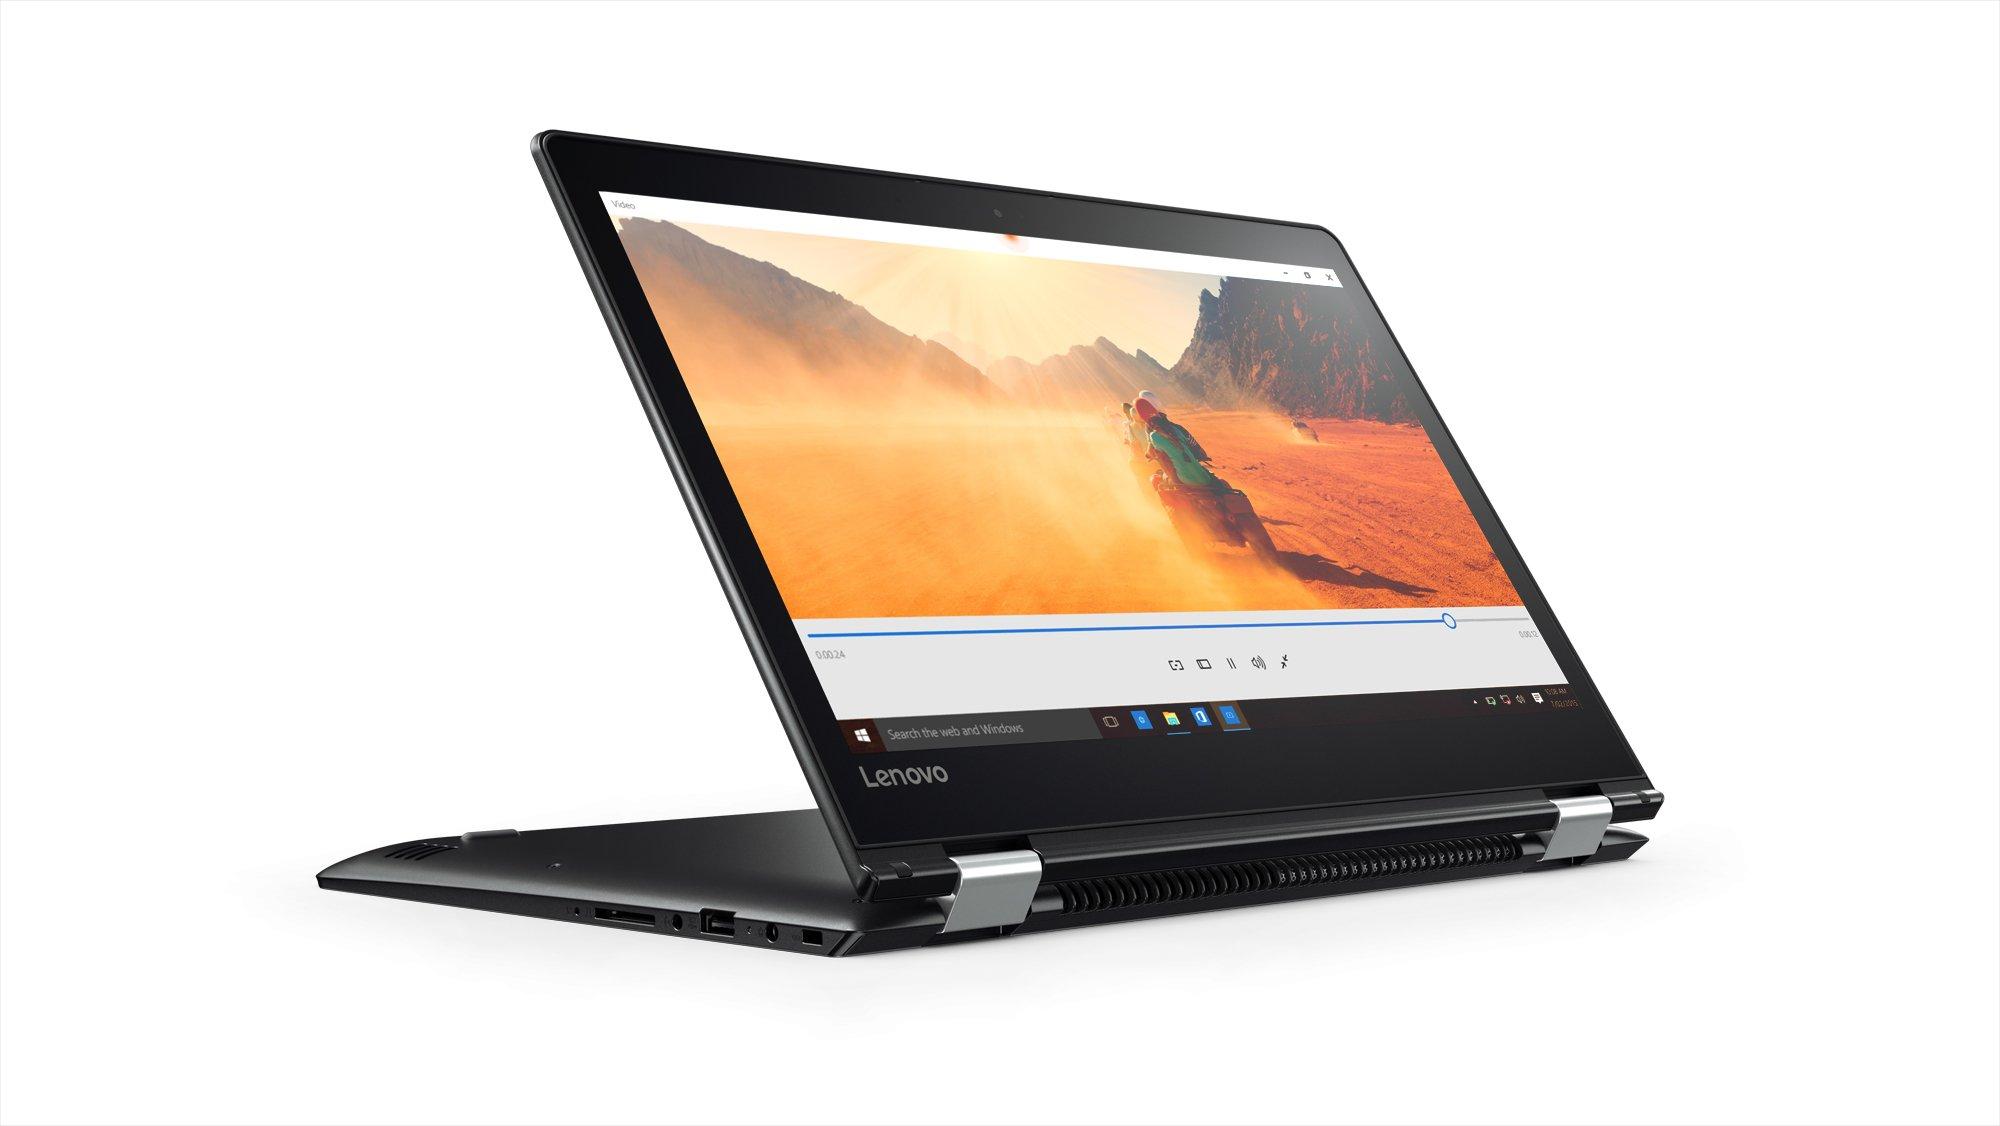 Lenovo Flex 4 - 2-in-1 Laptop/Tablet 14.0'' Full HD Touchscreen Display (Intel Core i5, 8 GB RAM, 256 GB SSD, Windows 10) 80SA0004US